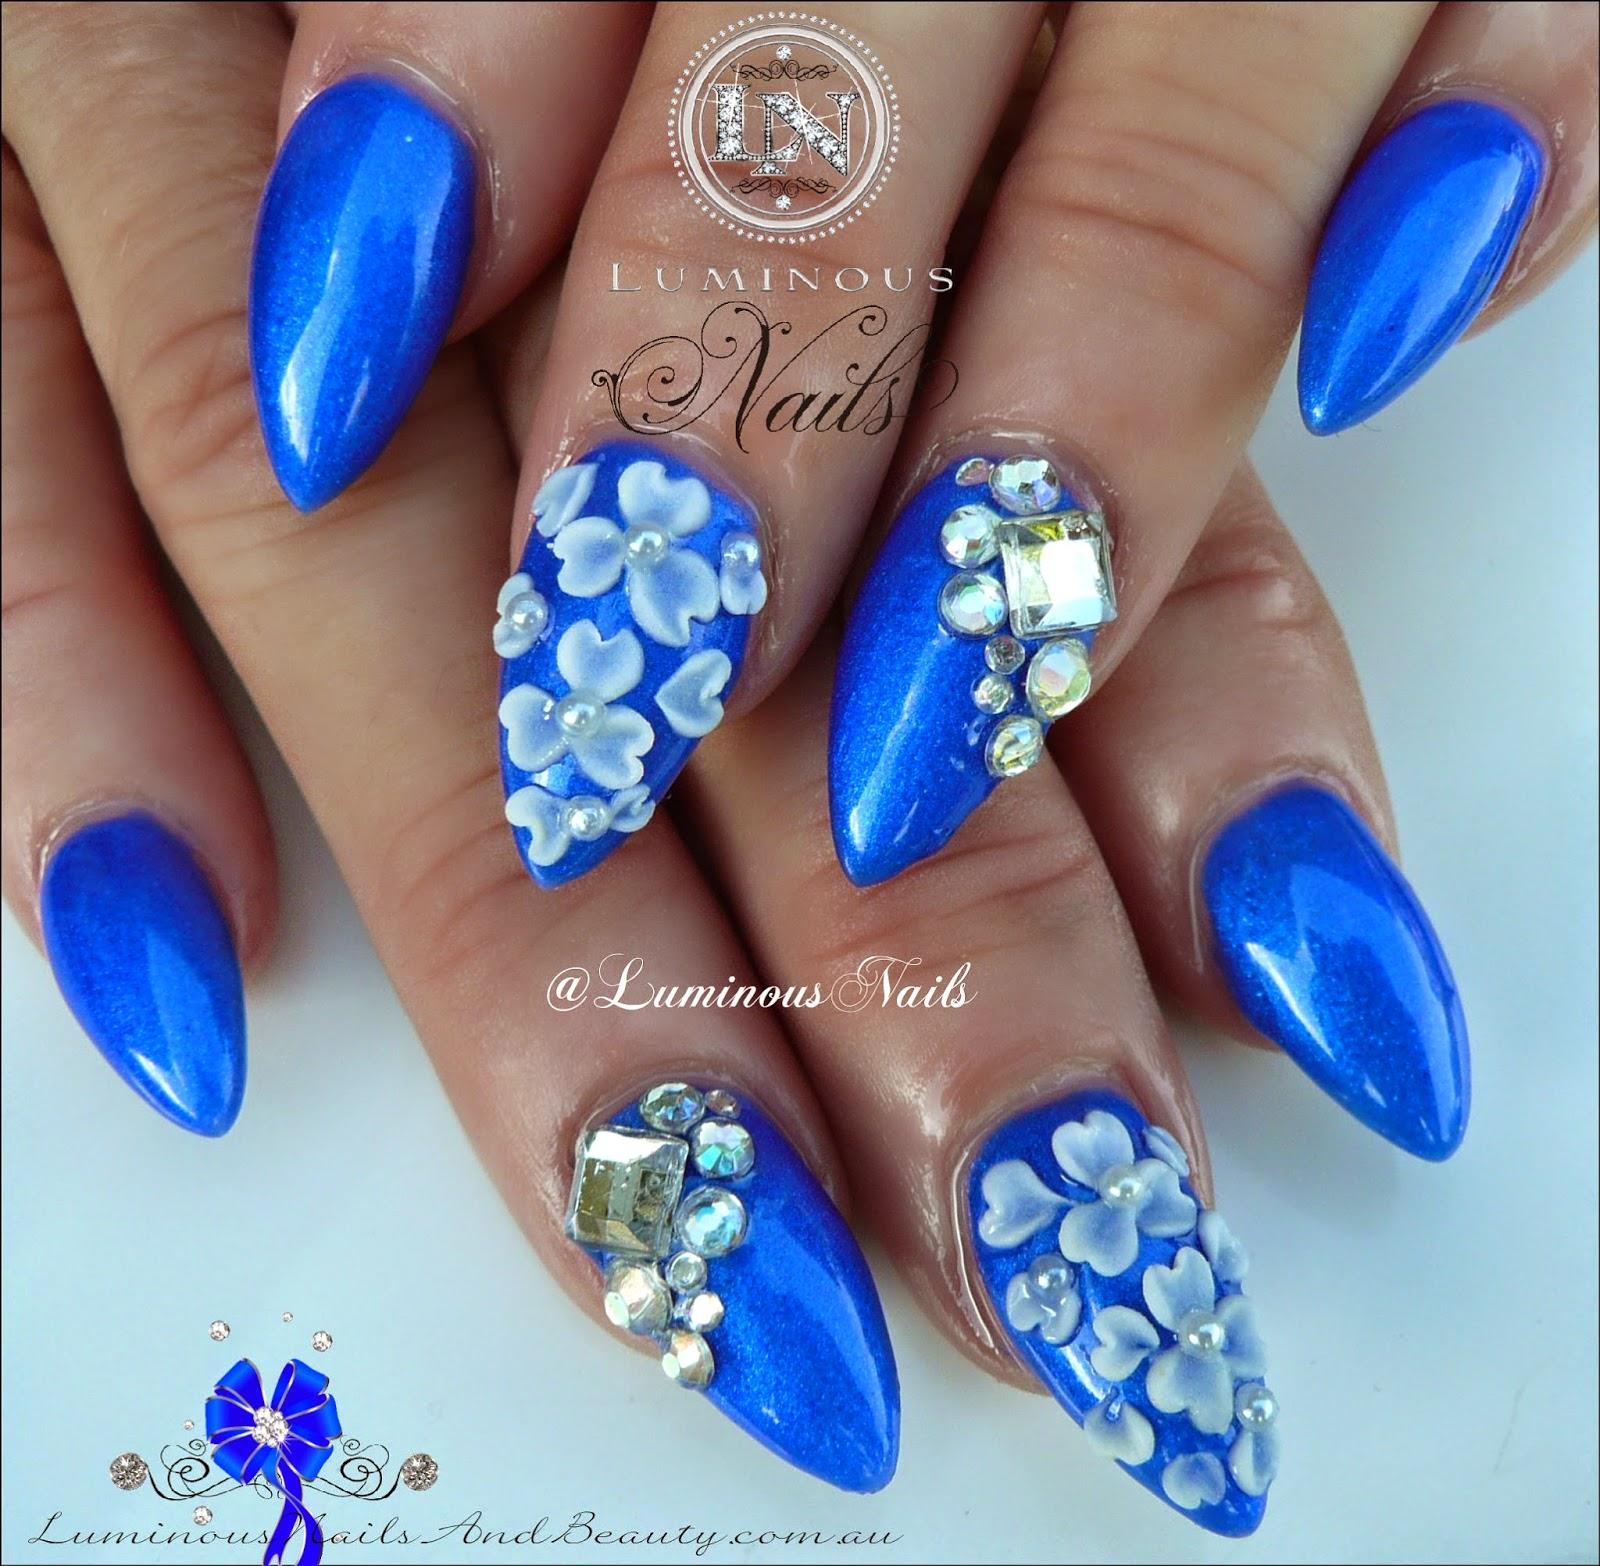 Blue Gel Nail Art Designs ~ Nail art gel blu pictures to pin on